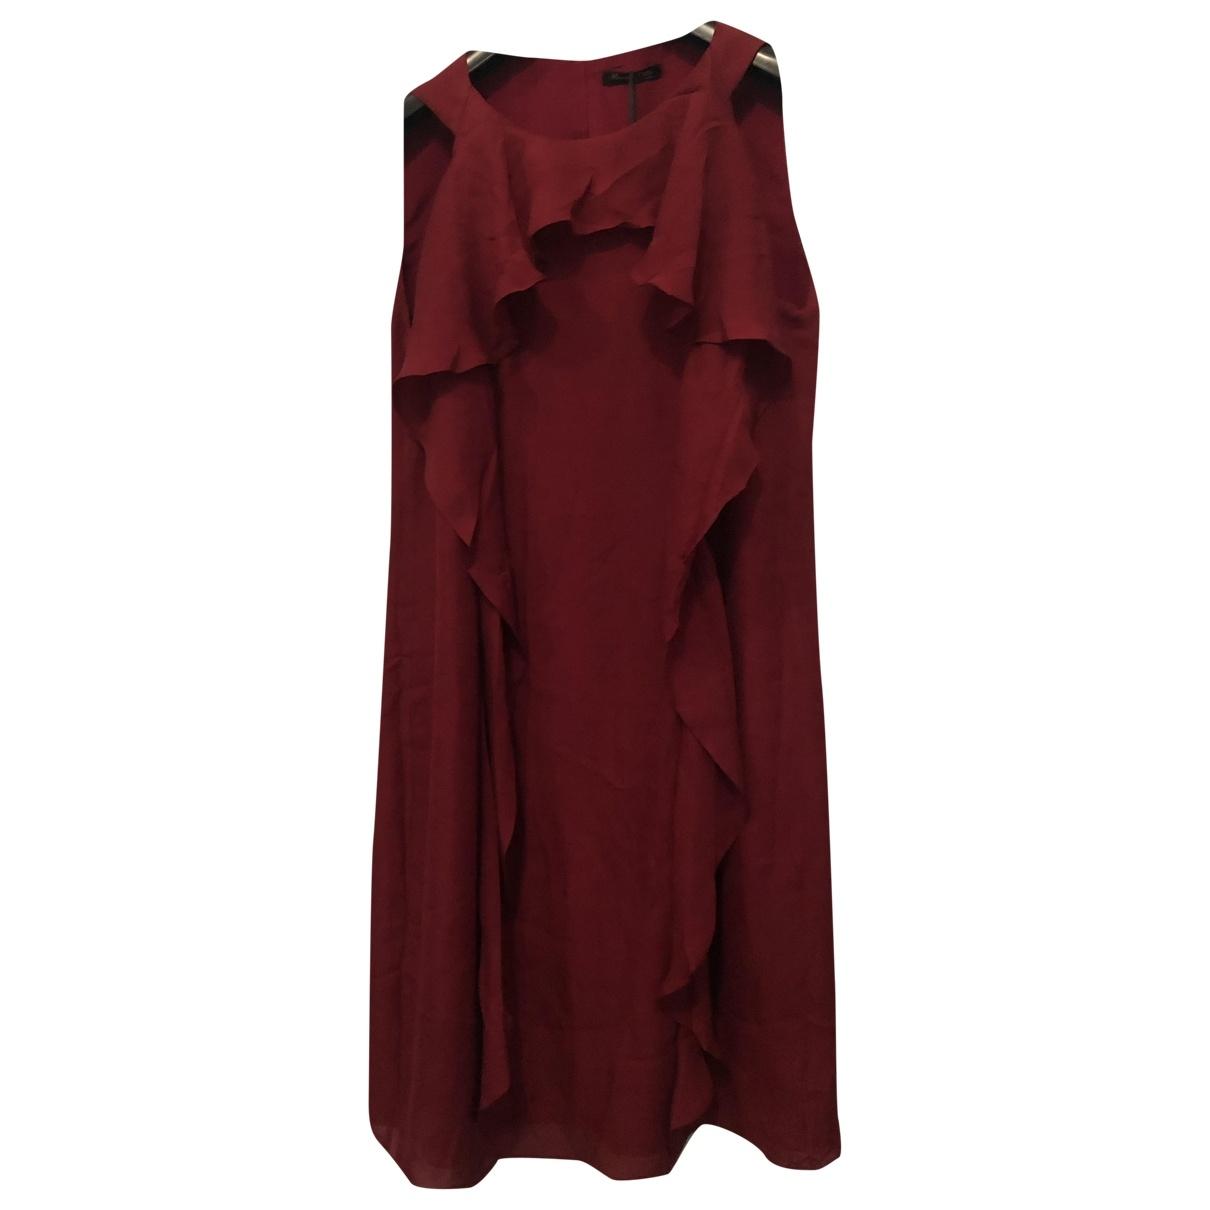 Massimo Dutti \N Burgundy Silk dress for Women 38 IT